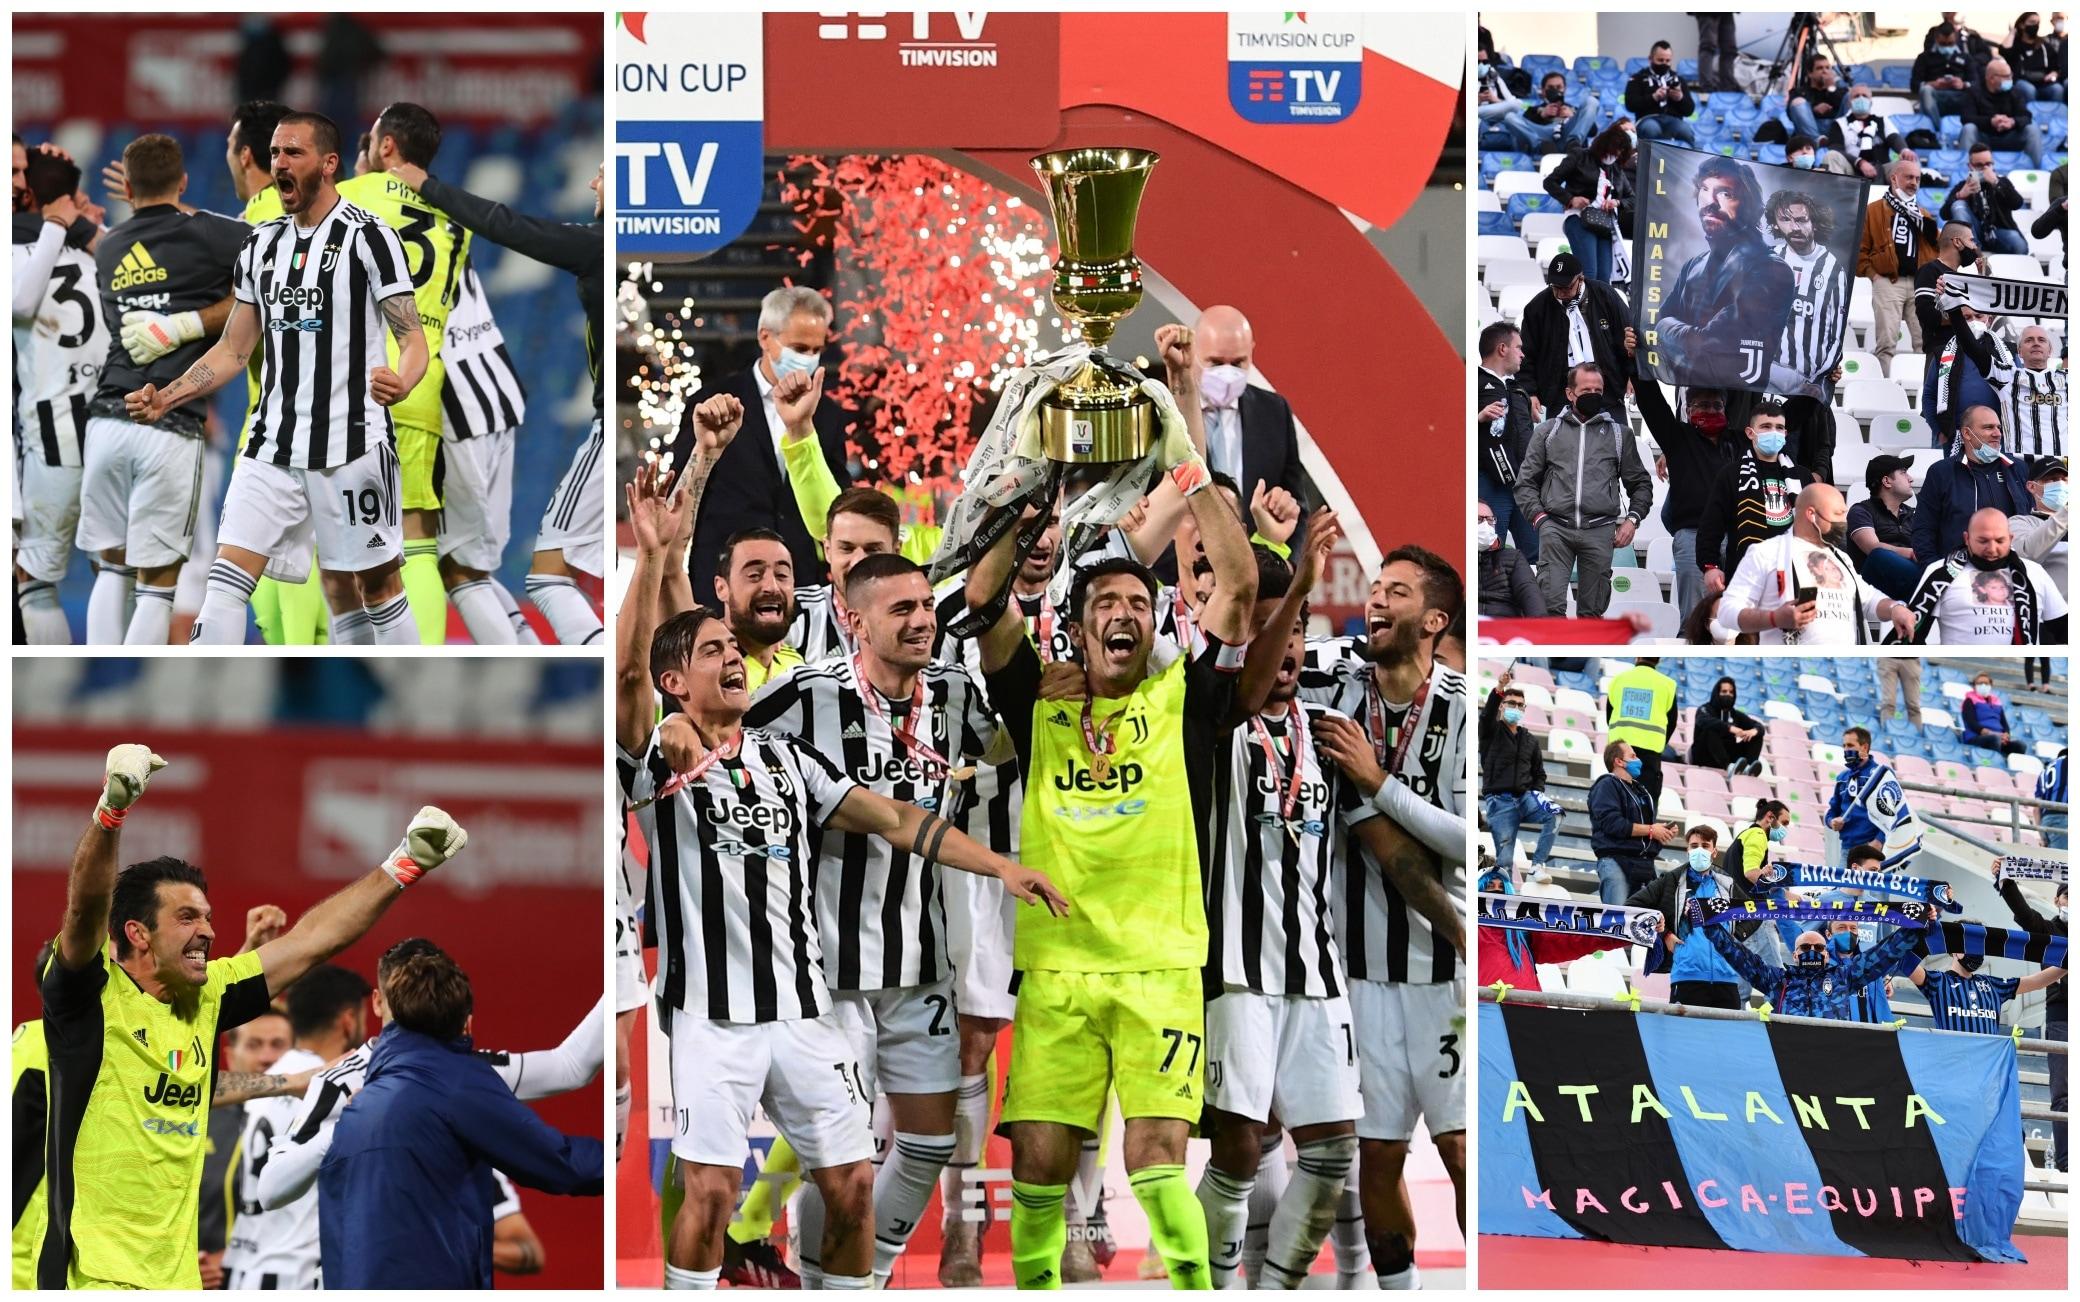 Finale Coppa Italia, vince la Juventus: 2-1 all'Atalanta. 4mila tifosi  tornano allo stadio. FOTO | Sky TG24